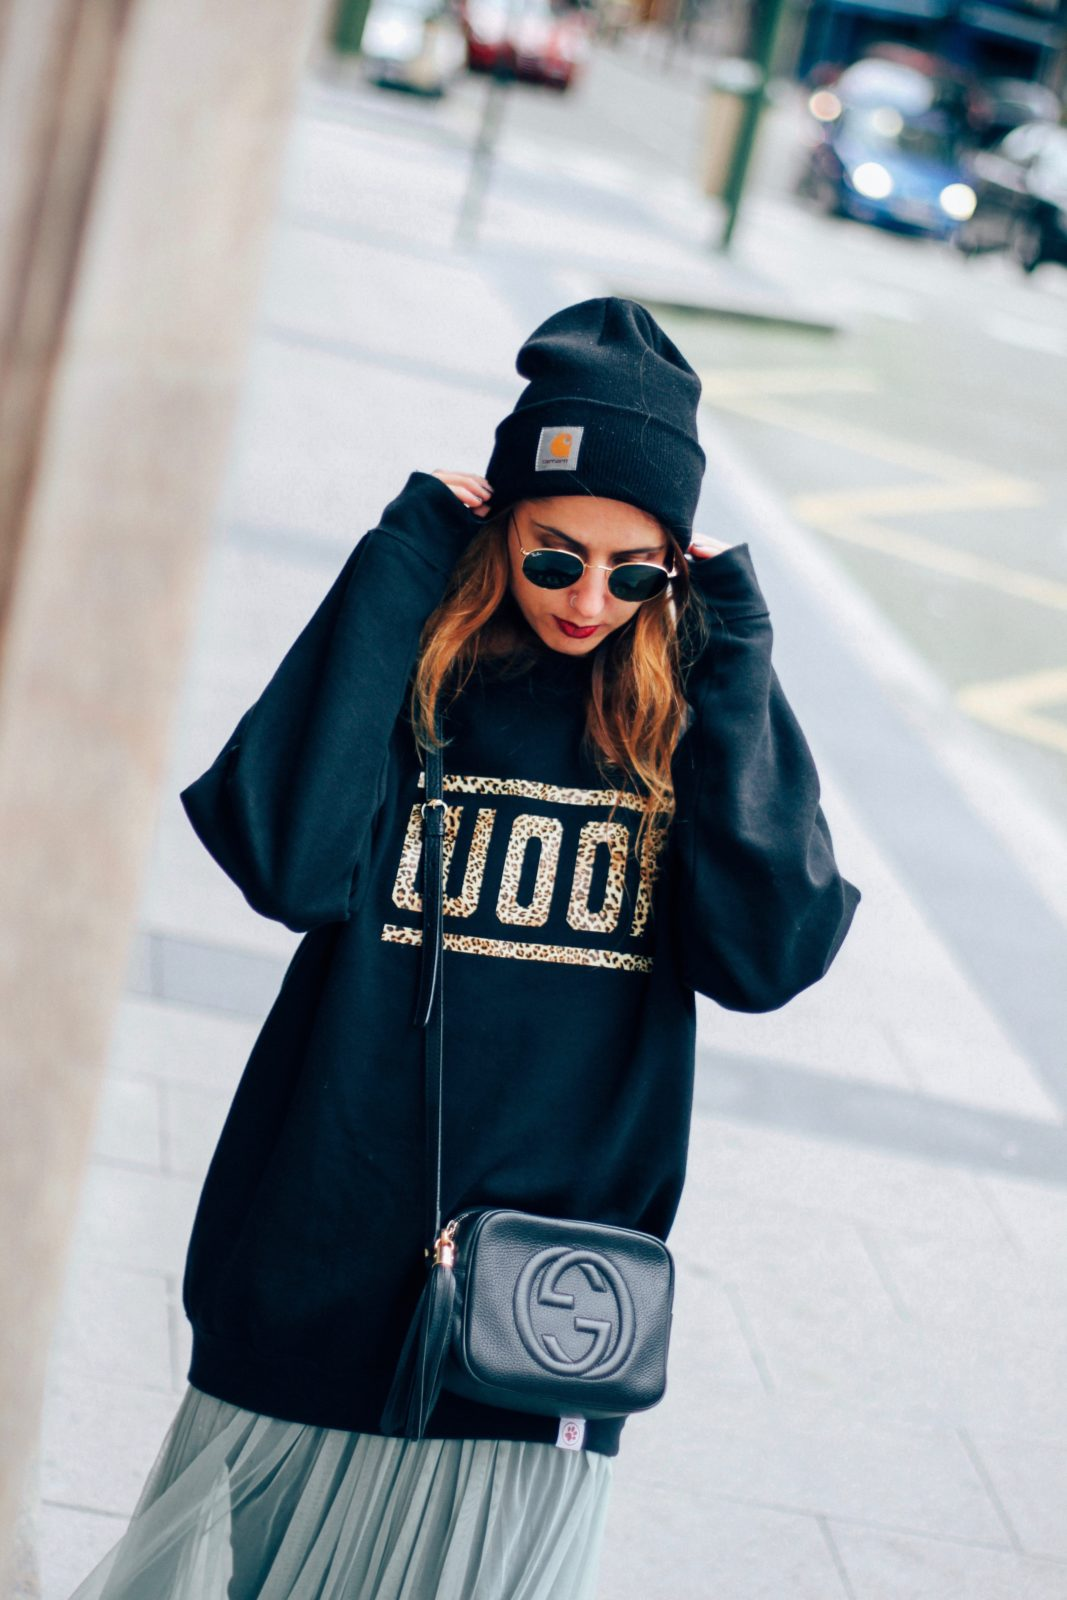 sudadera_old_dogs_falda_de_tul_vans_beanie_carhartt_look_donkeycool_street_style-33